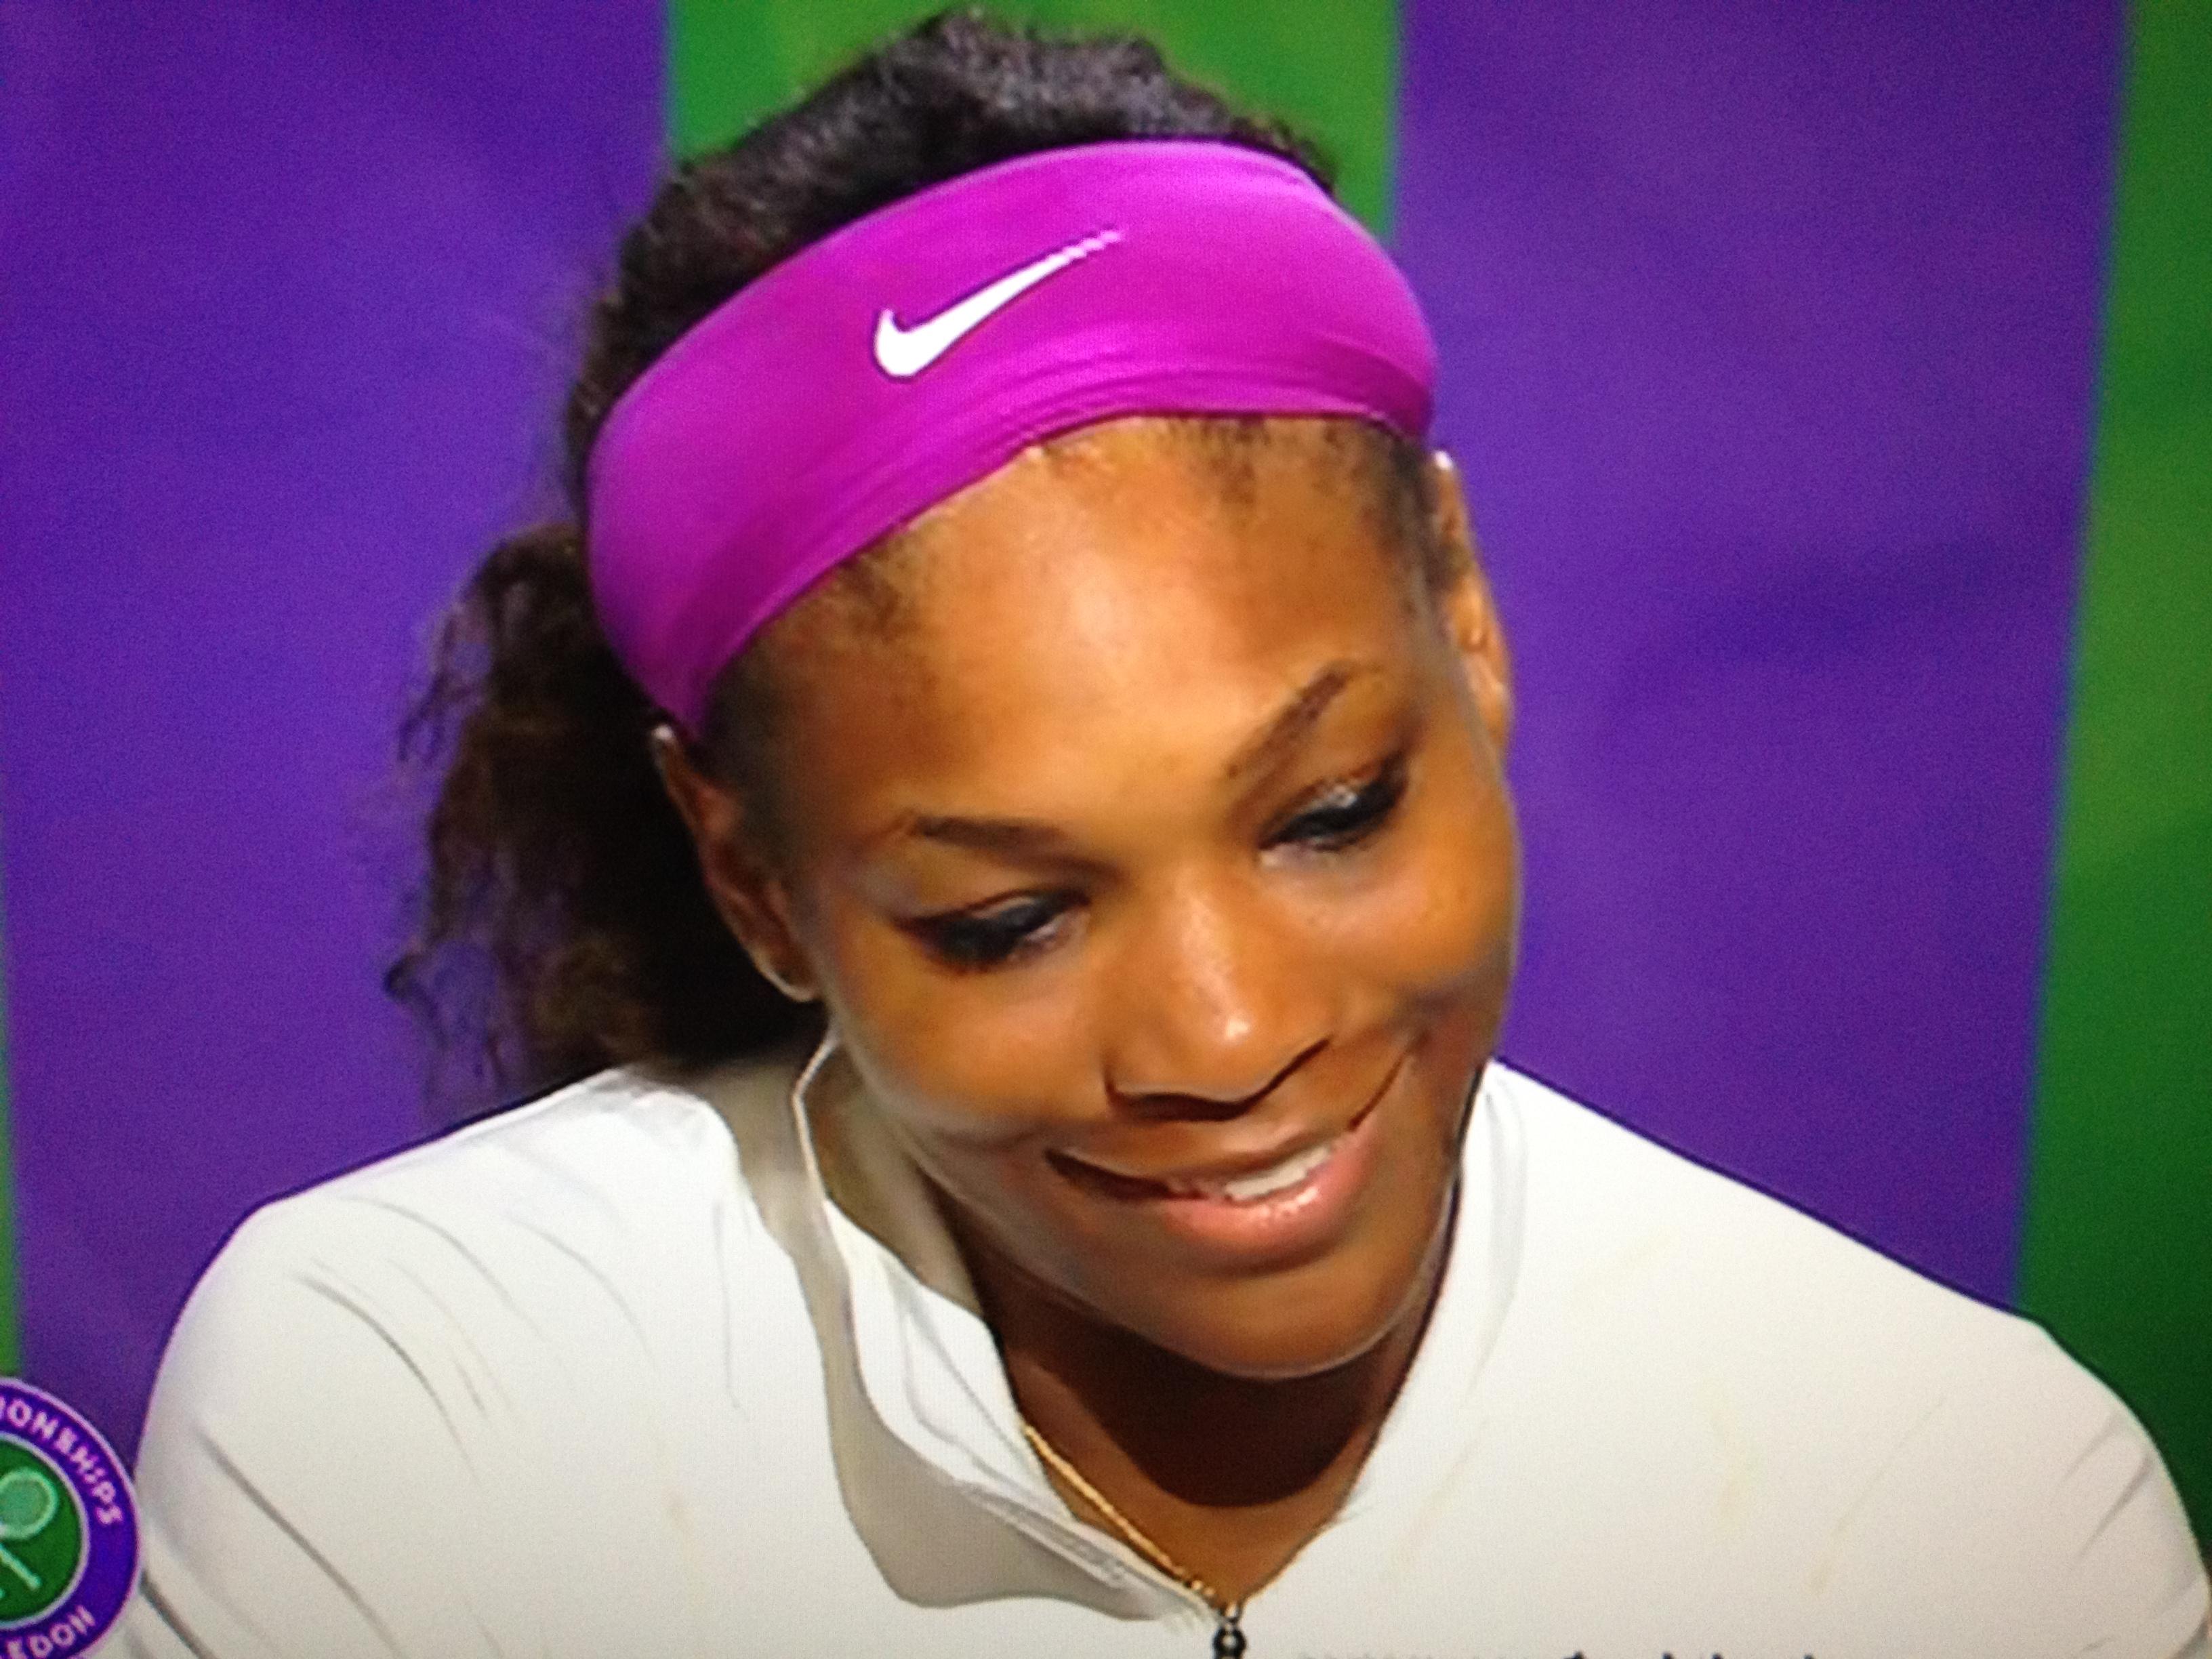 Williams: Serena Williams Makeup